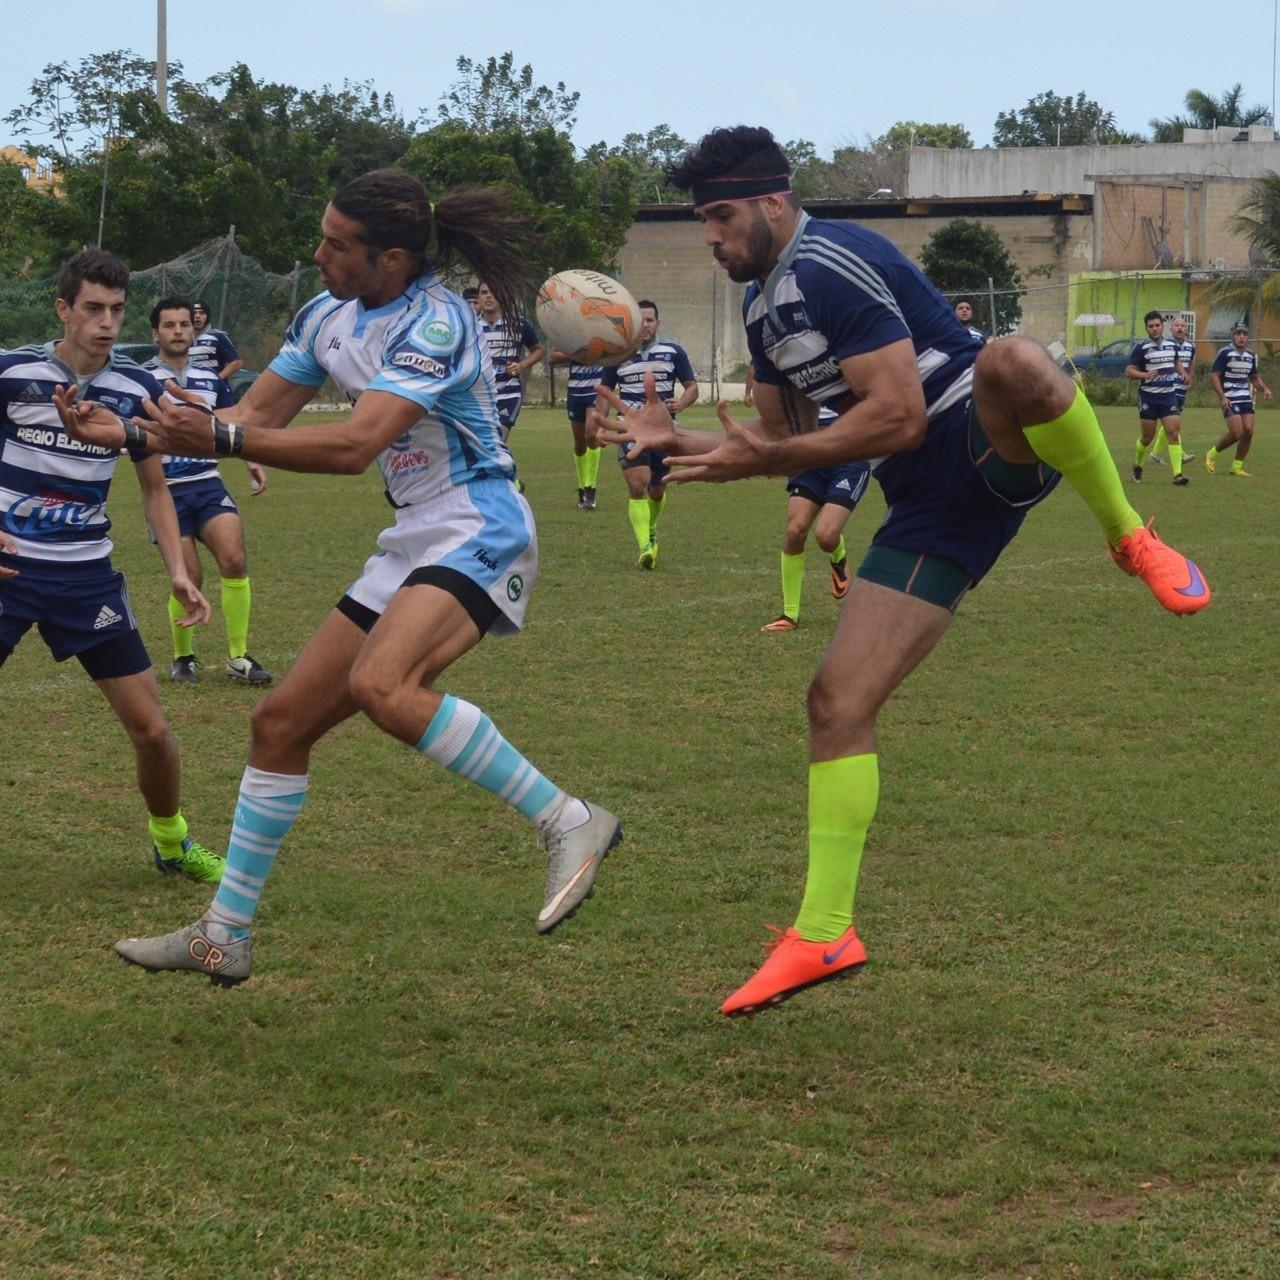 Cancun Hammerheads Rugby Dance v Cumiyais Monterrey Rugby Club in the FMRU Campeonato Nacional Semi Final - 12th March 2016 #cancunhammerheads #cumiyaisrugby